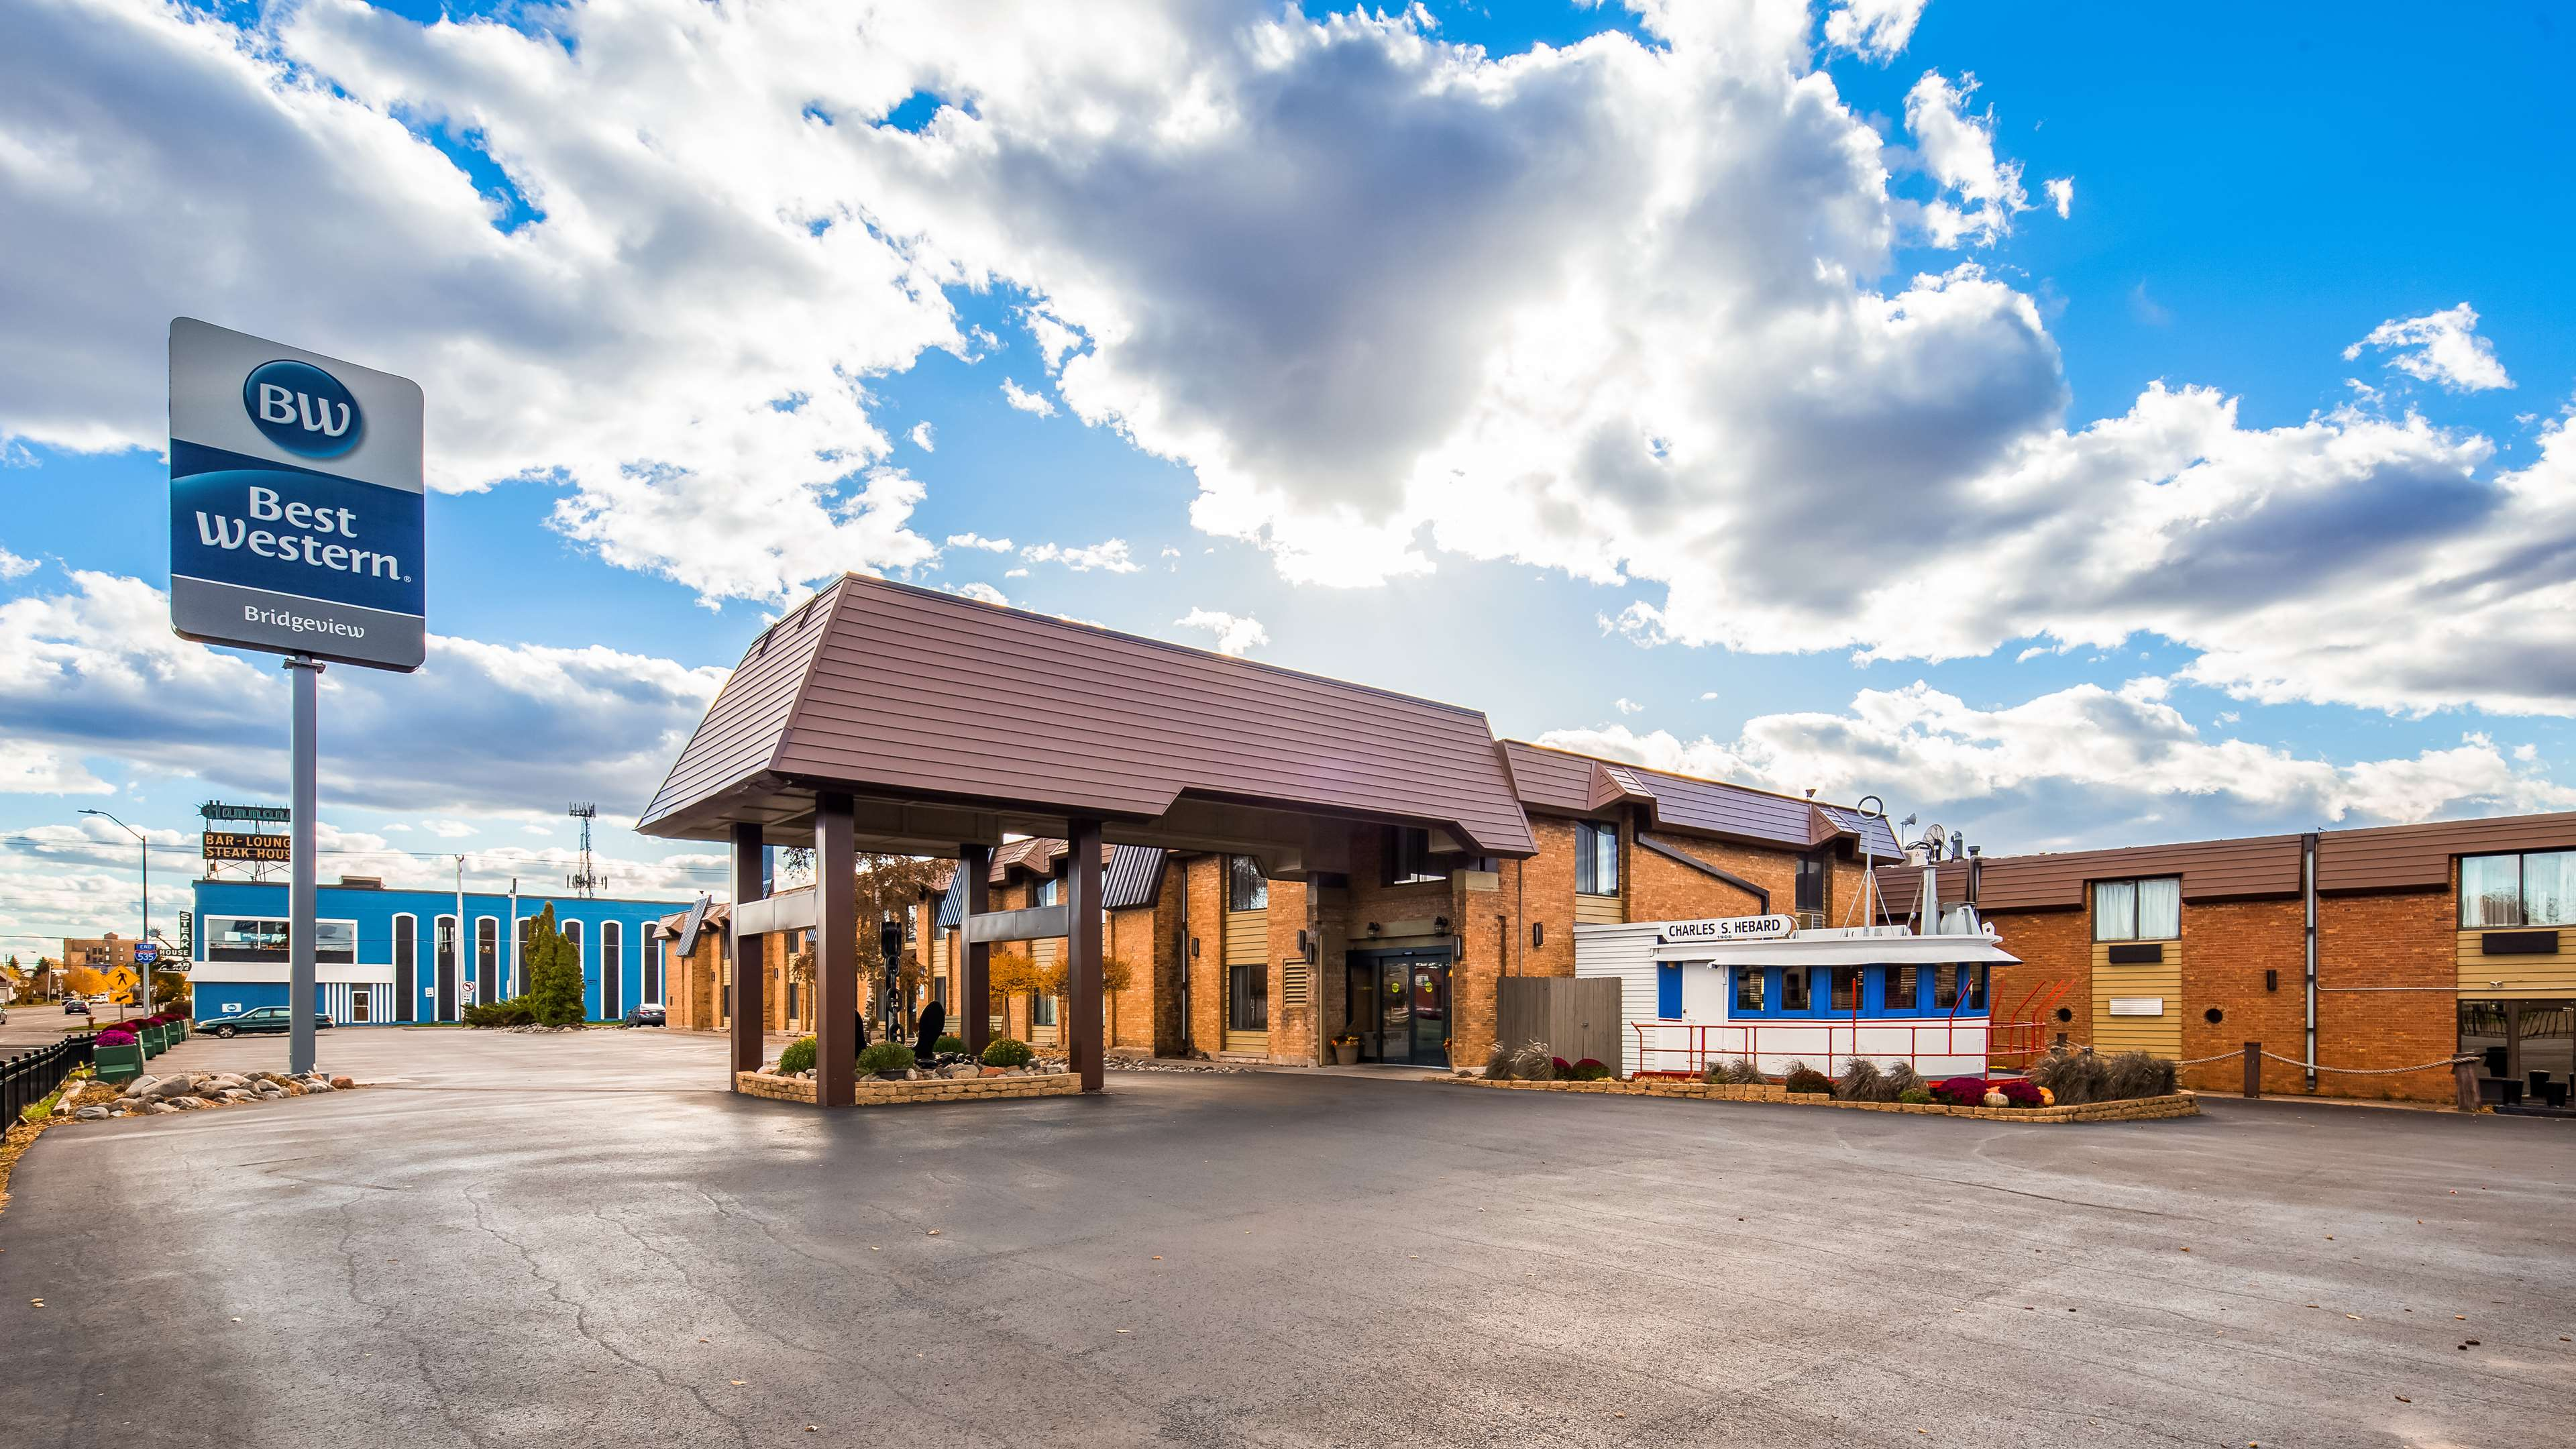 Best Western Bridgeview Hotel image 0